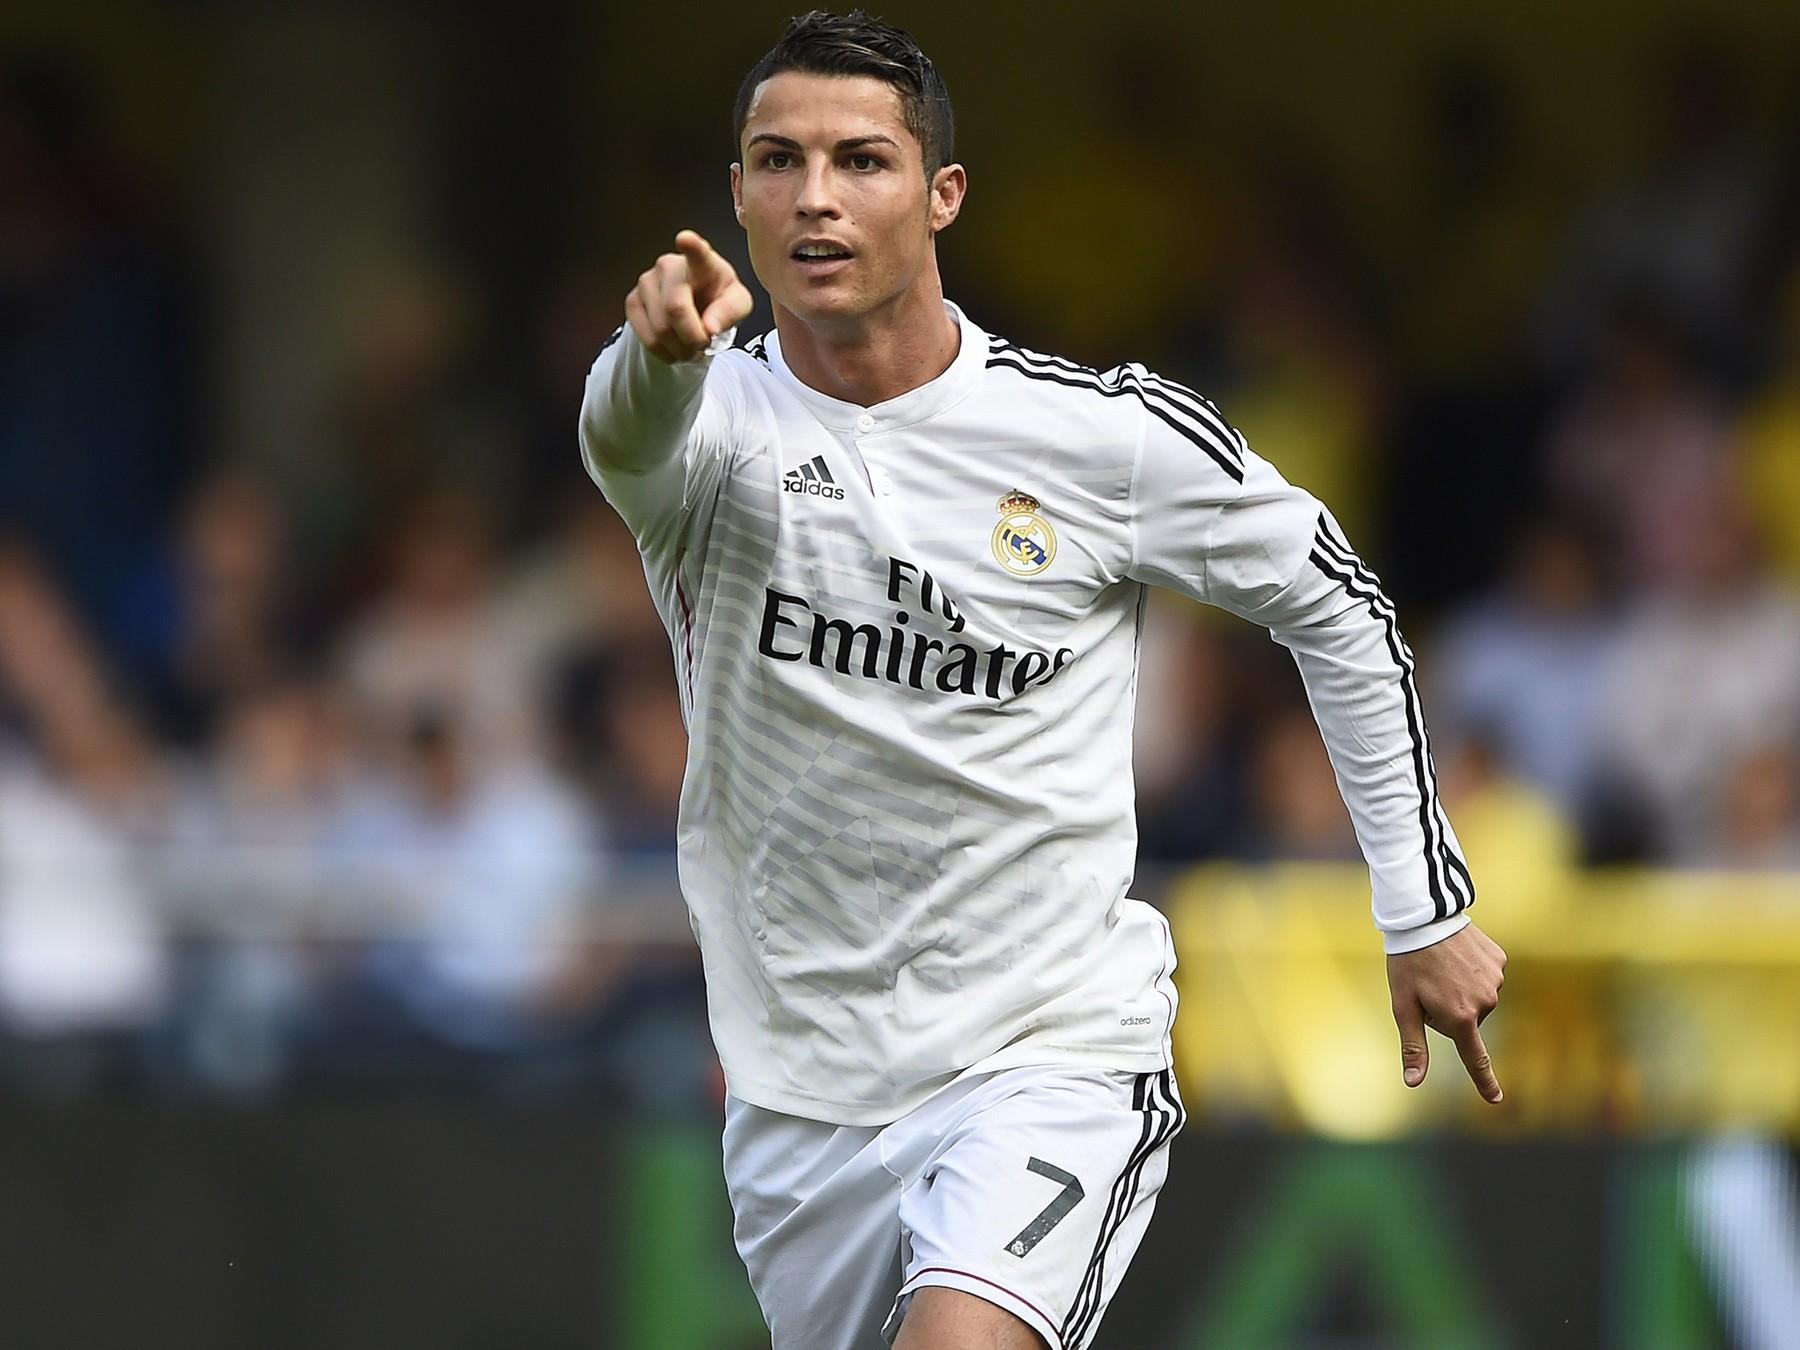 Cristiano Ronaldo, mon neveu, le foot et la motivation !